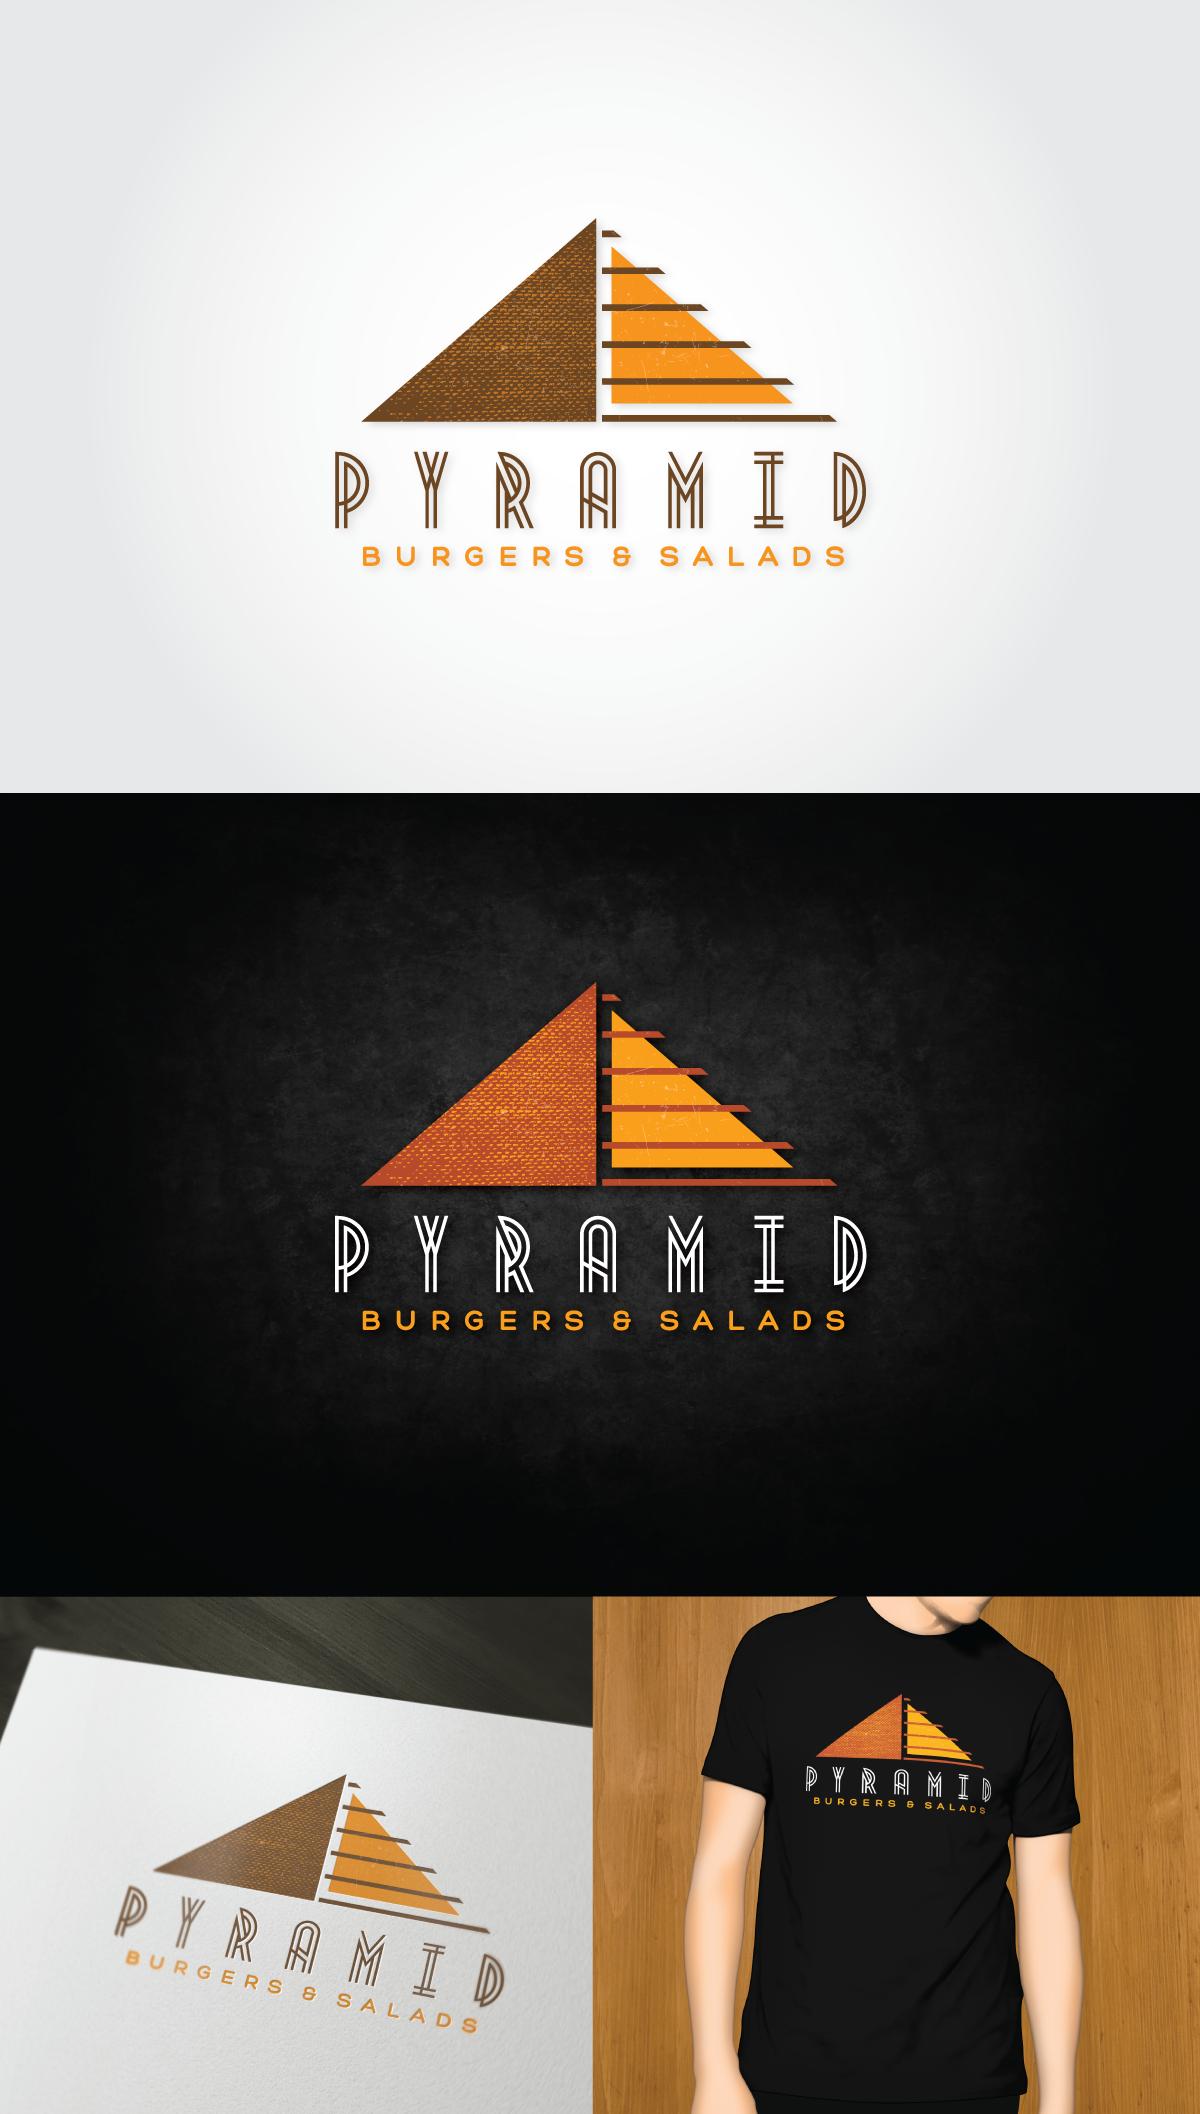 Pyramid Burgers Needs an Eye-Catching Brand-Building Logo!